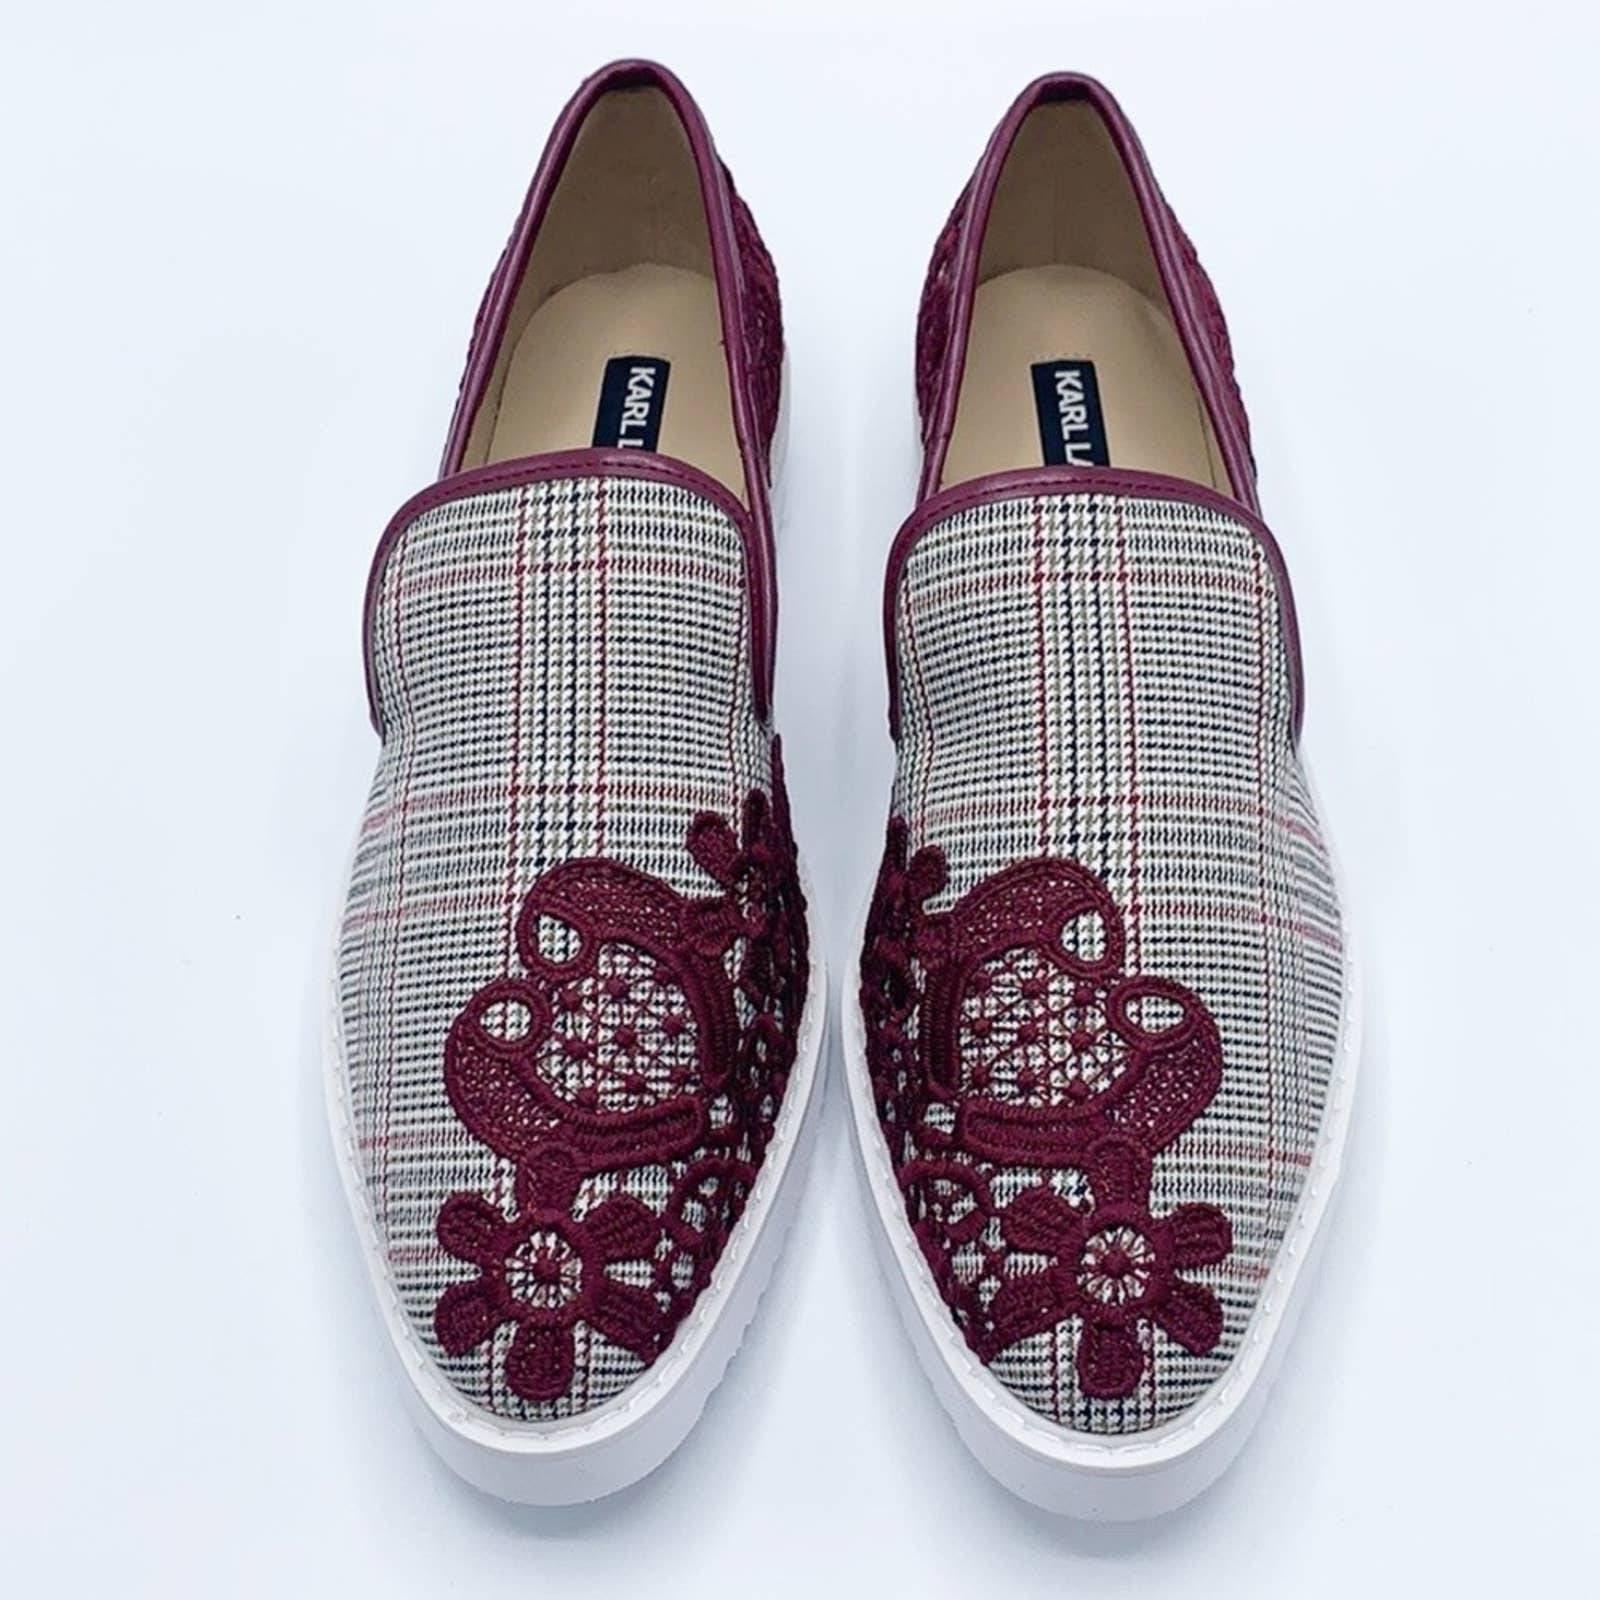 KARL LAGERFELD PARIS Carlyn Shoes, 7M